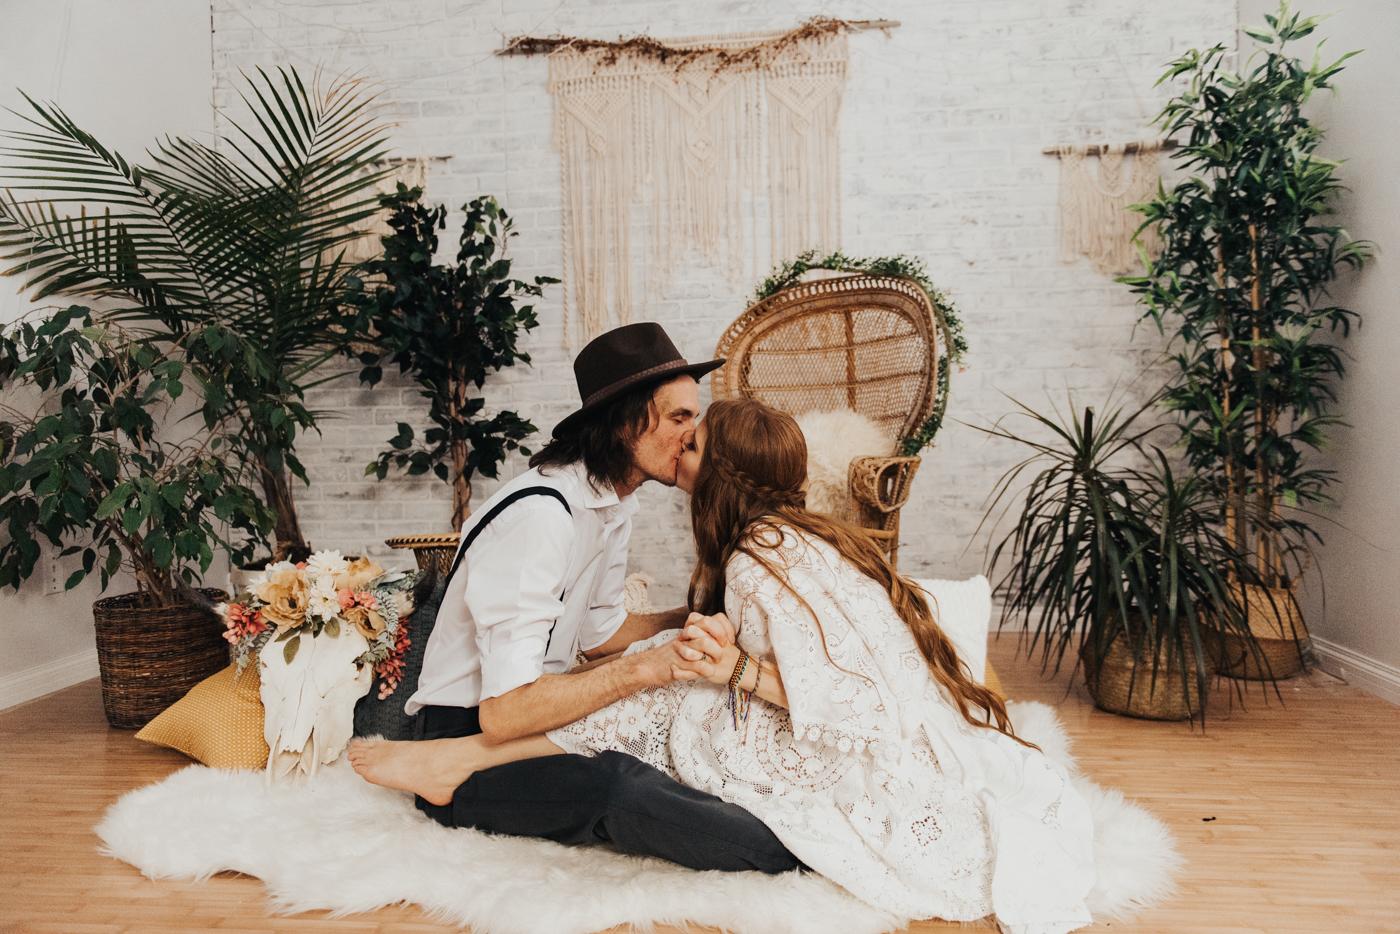 FortSt.John_photographer_TyraEPhotography_Wedding_Couple_Family_Photograhy_DawsonCreek_Elopement_Bride_Boduoir_Portraits-4876.jpg